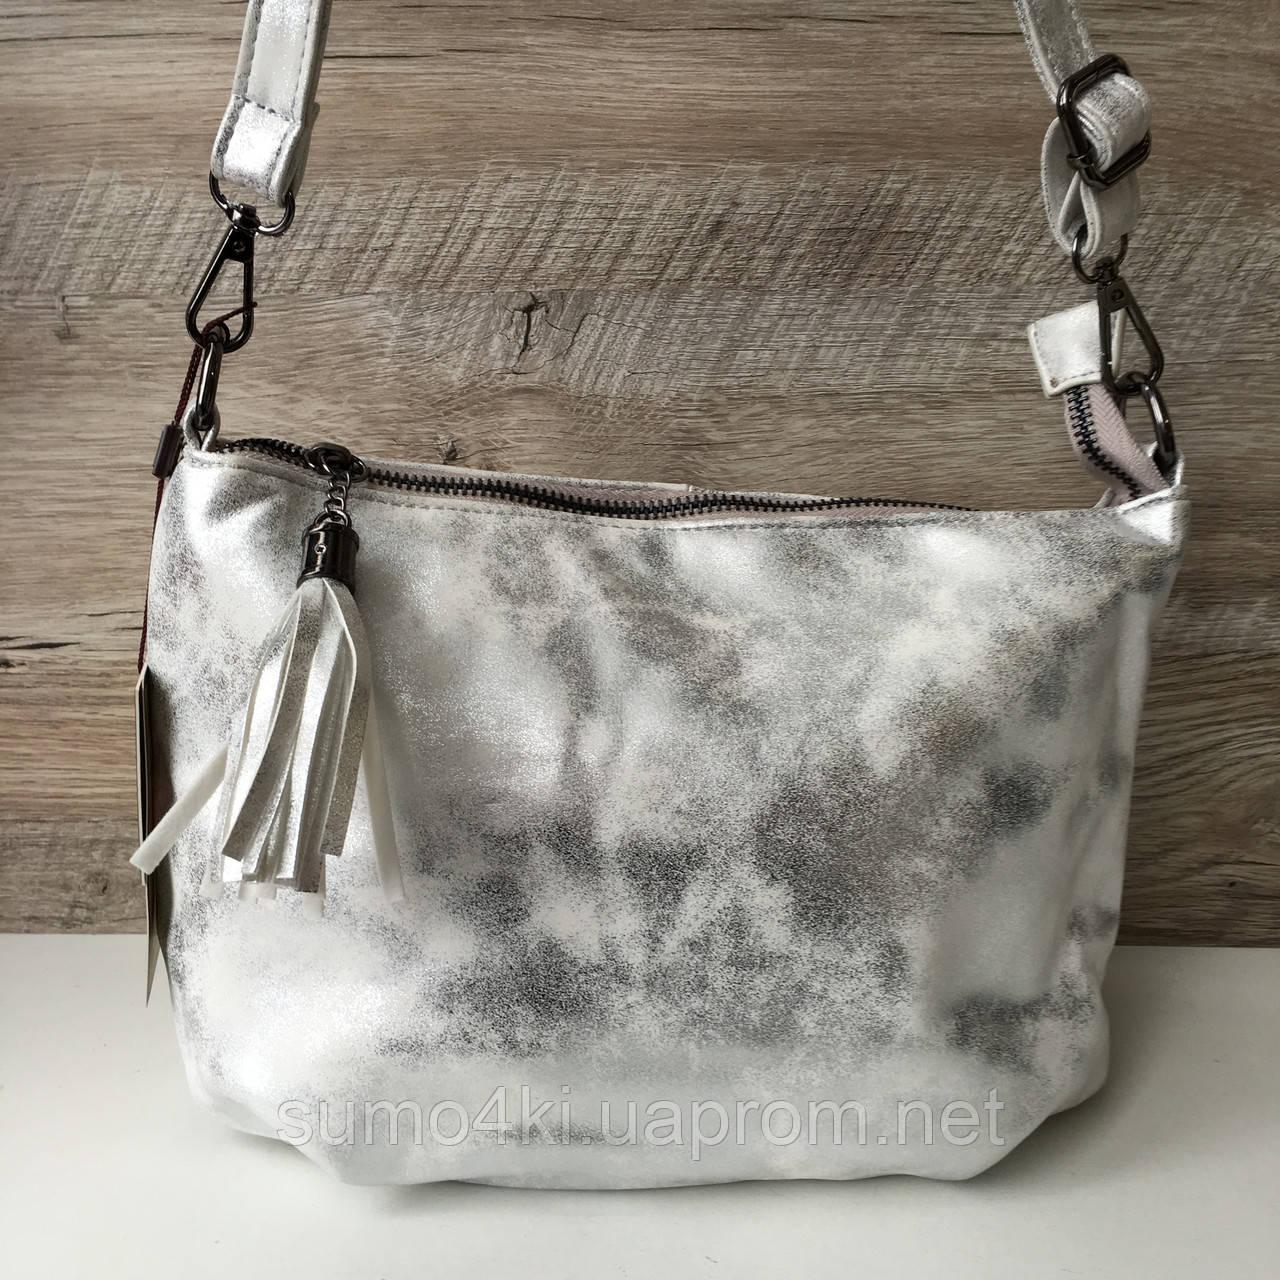 b83b6ed18402 Купить Женскую яркую летнюю сумку Valensiy серебро Бронзу Золото ...